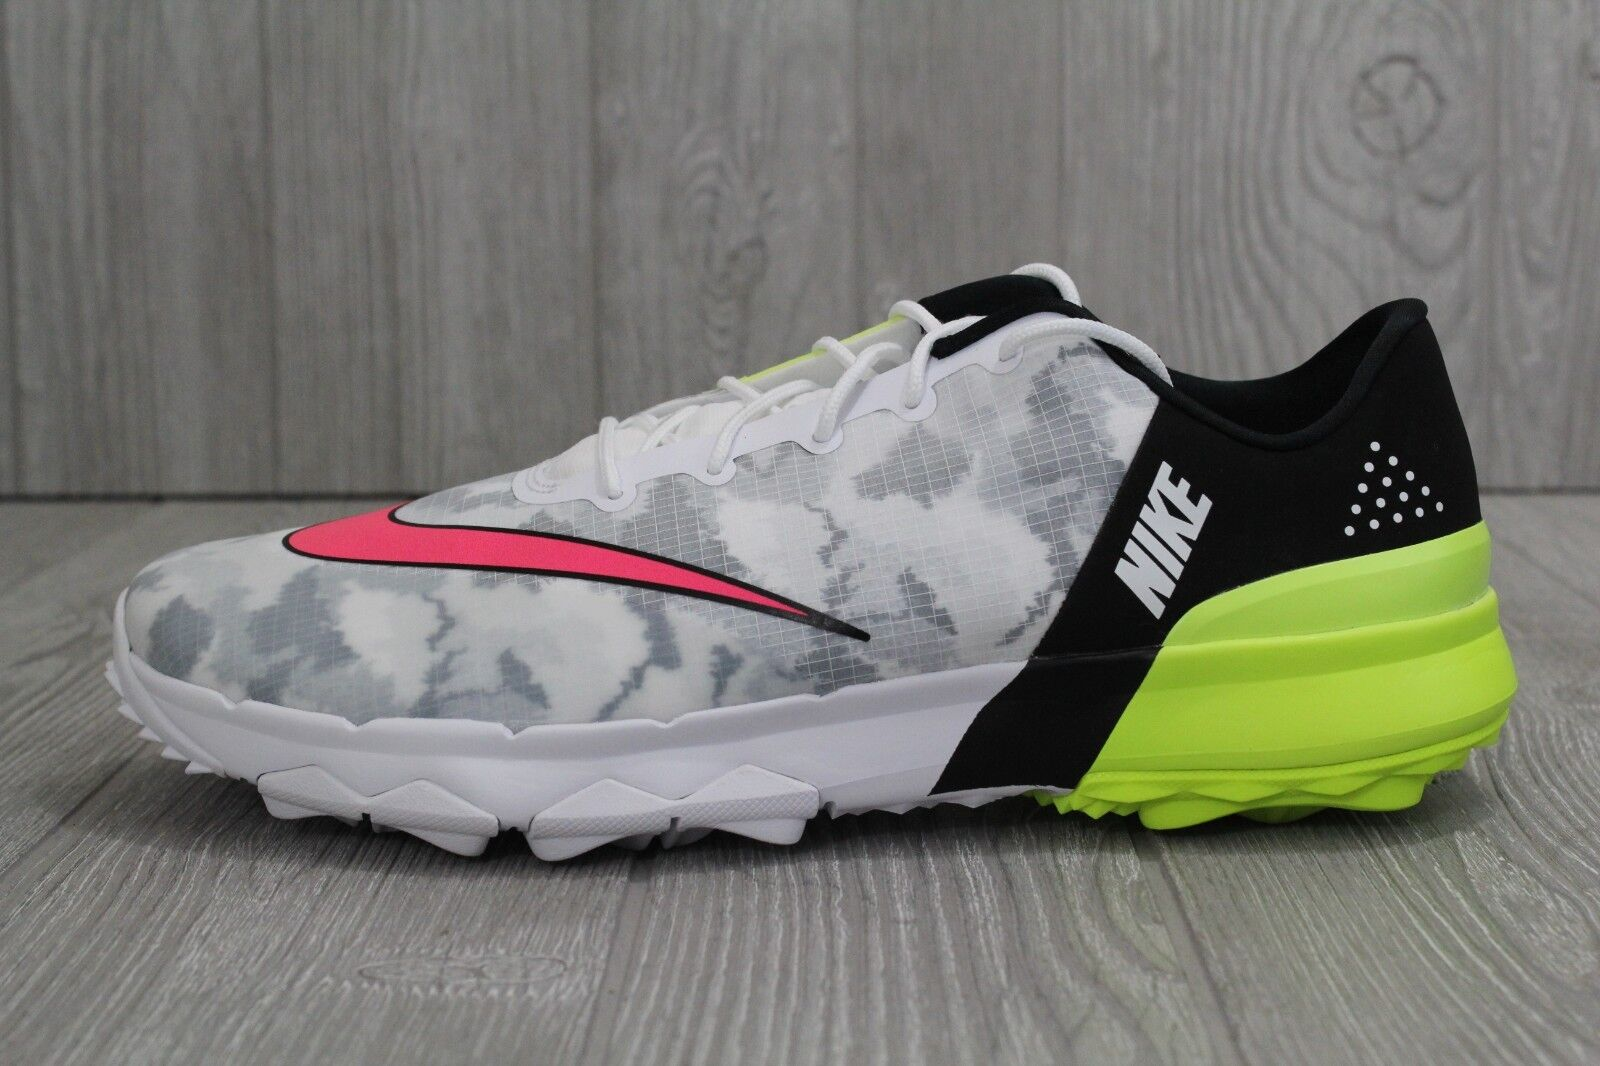 31 Mens Nike FI Flex Golf Shoes White/Racer Pink/Black/Volt 9.5-12 849960-101 Casual wild